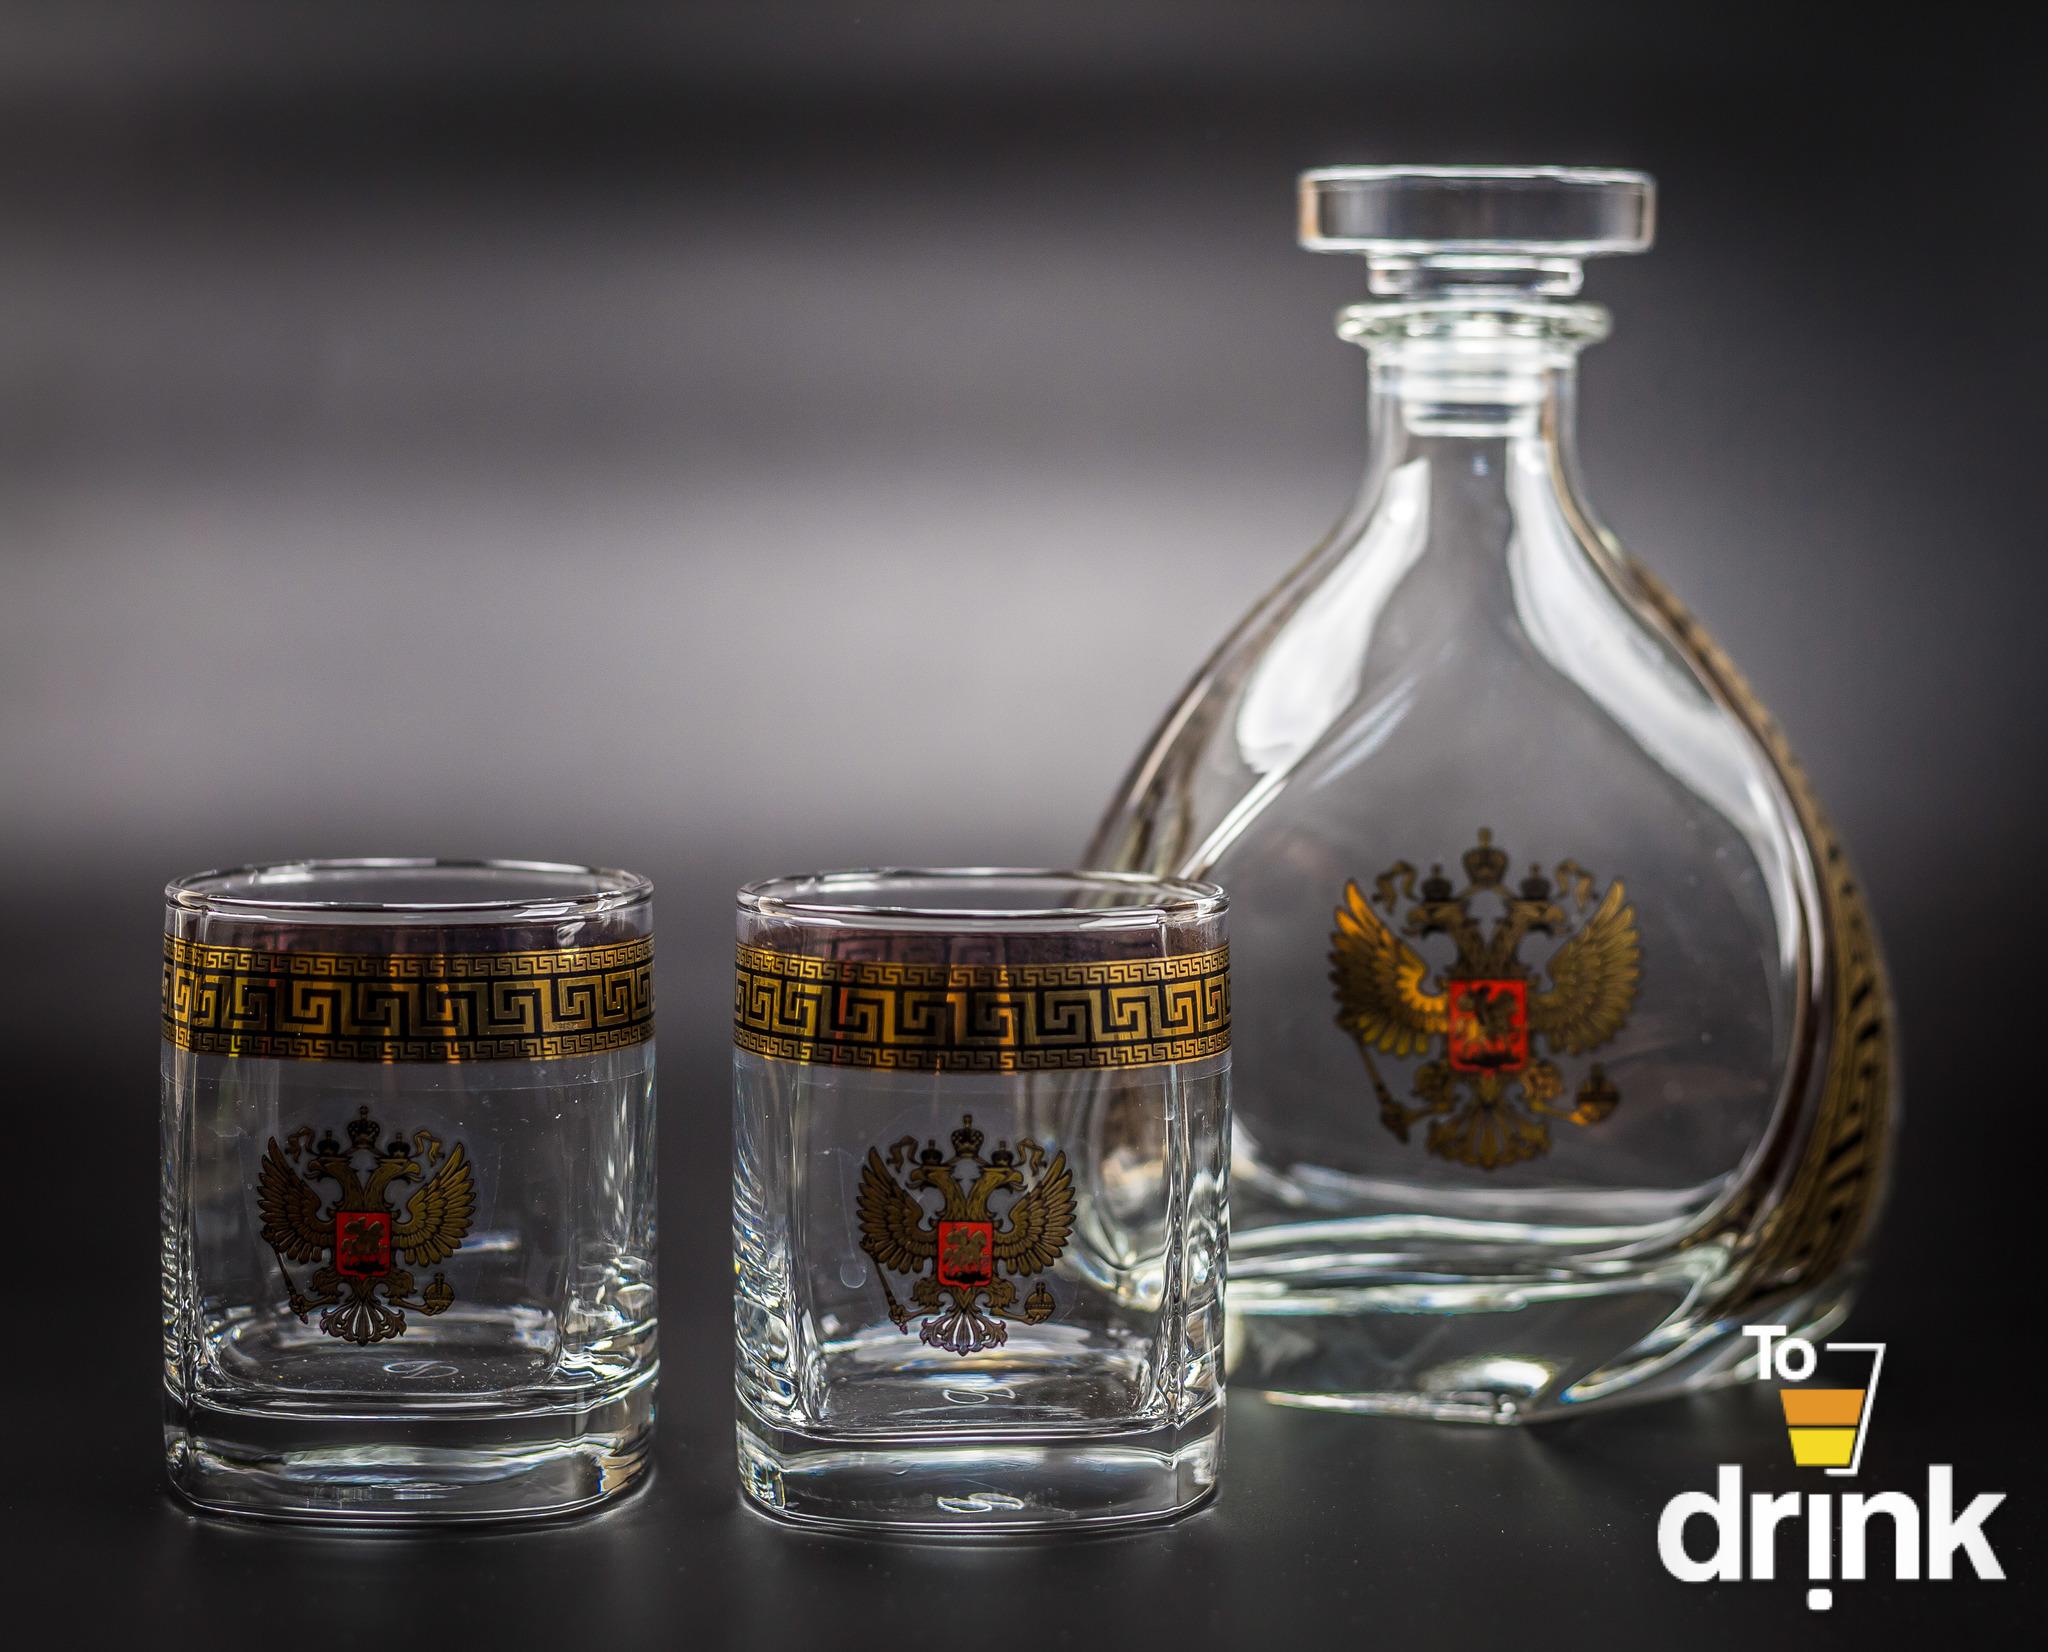 Подарочный набор «Отчизна»: штоф 800 мл, 2 стакана 275 мл штоф rcr bubble 800 мл